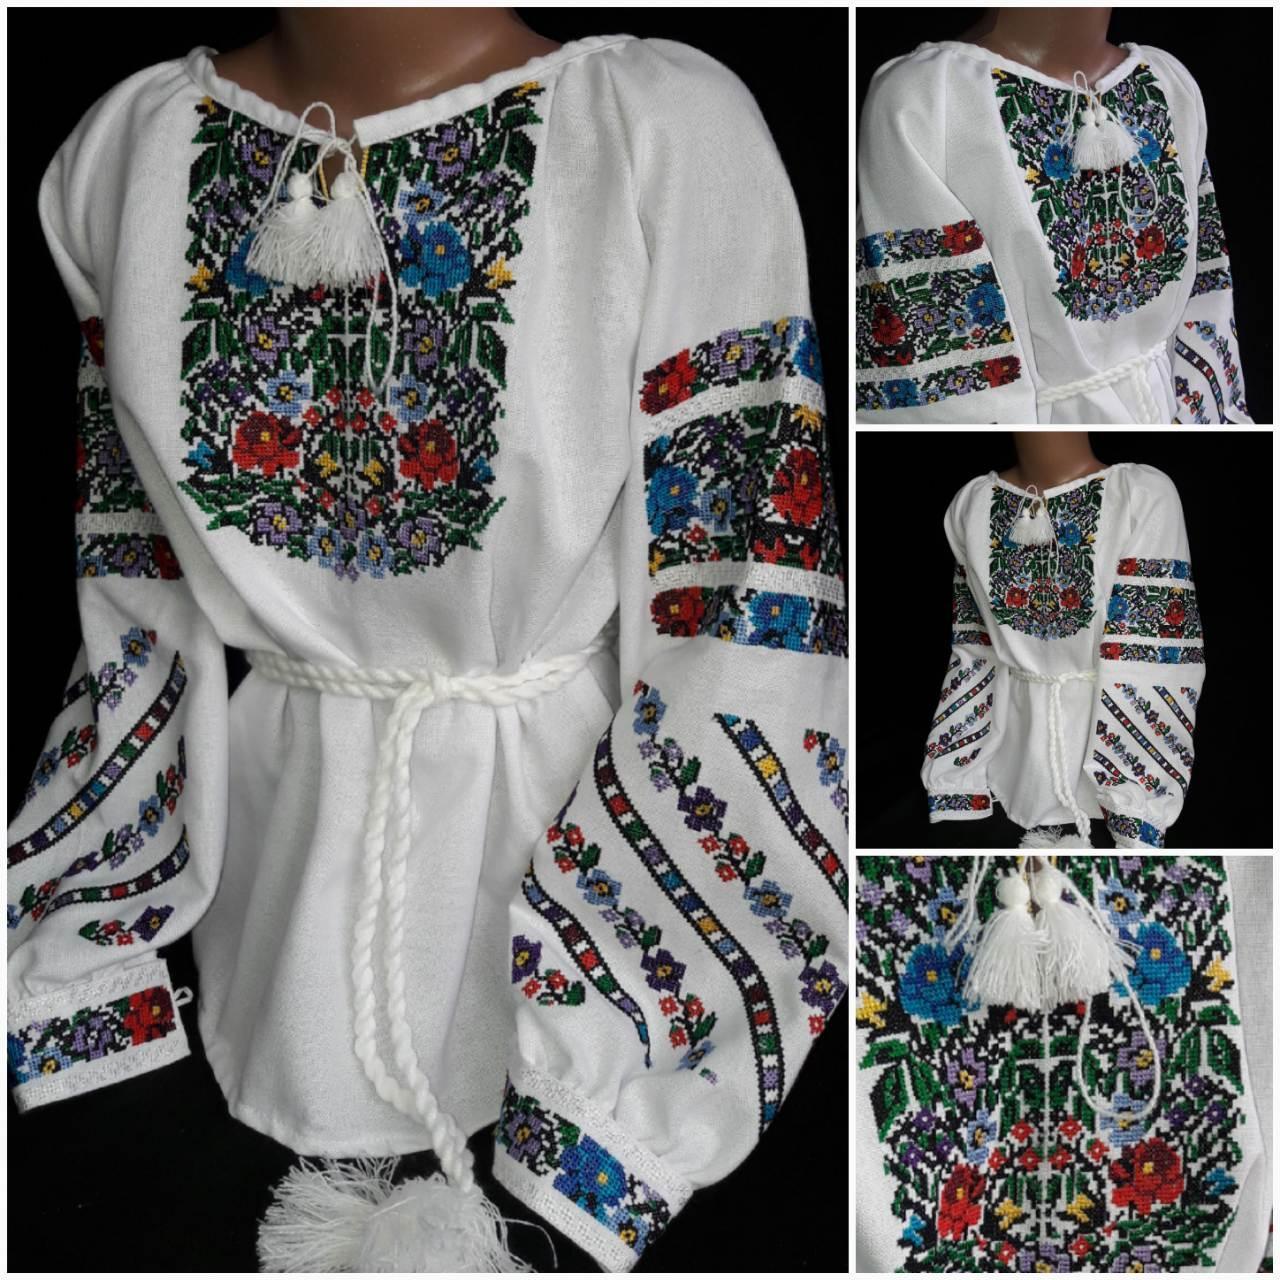 "Детская вышиванка ""Маричка"", цвет белый, домотканка, 6-12 лет, 540/440 (цена за 1 шт. + 100 гр.)"